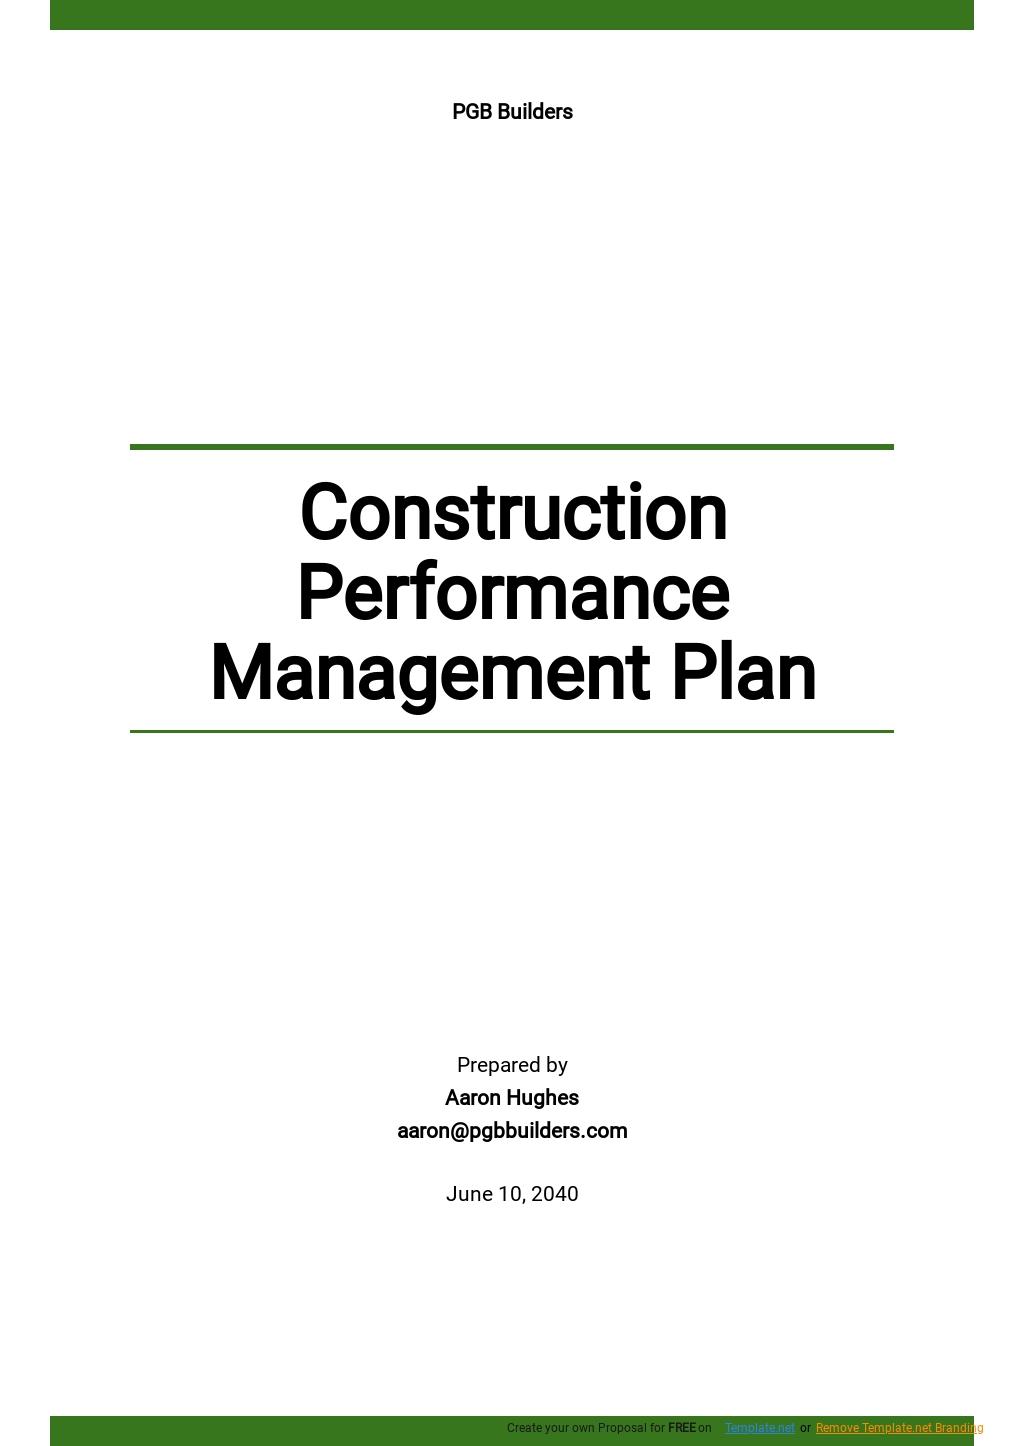 Construction Performance Management Plan Template.jpe